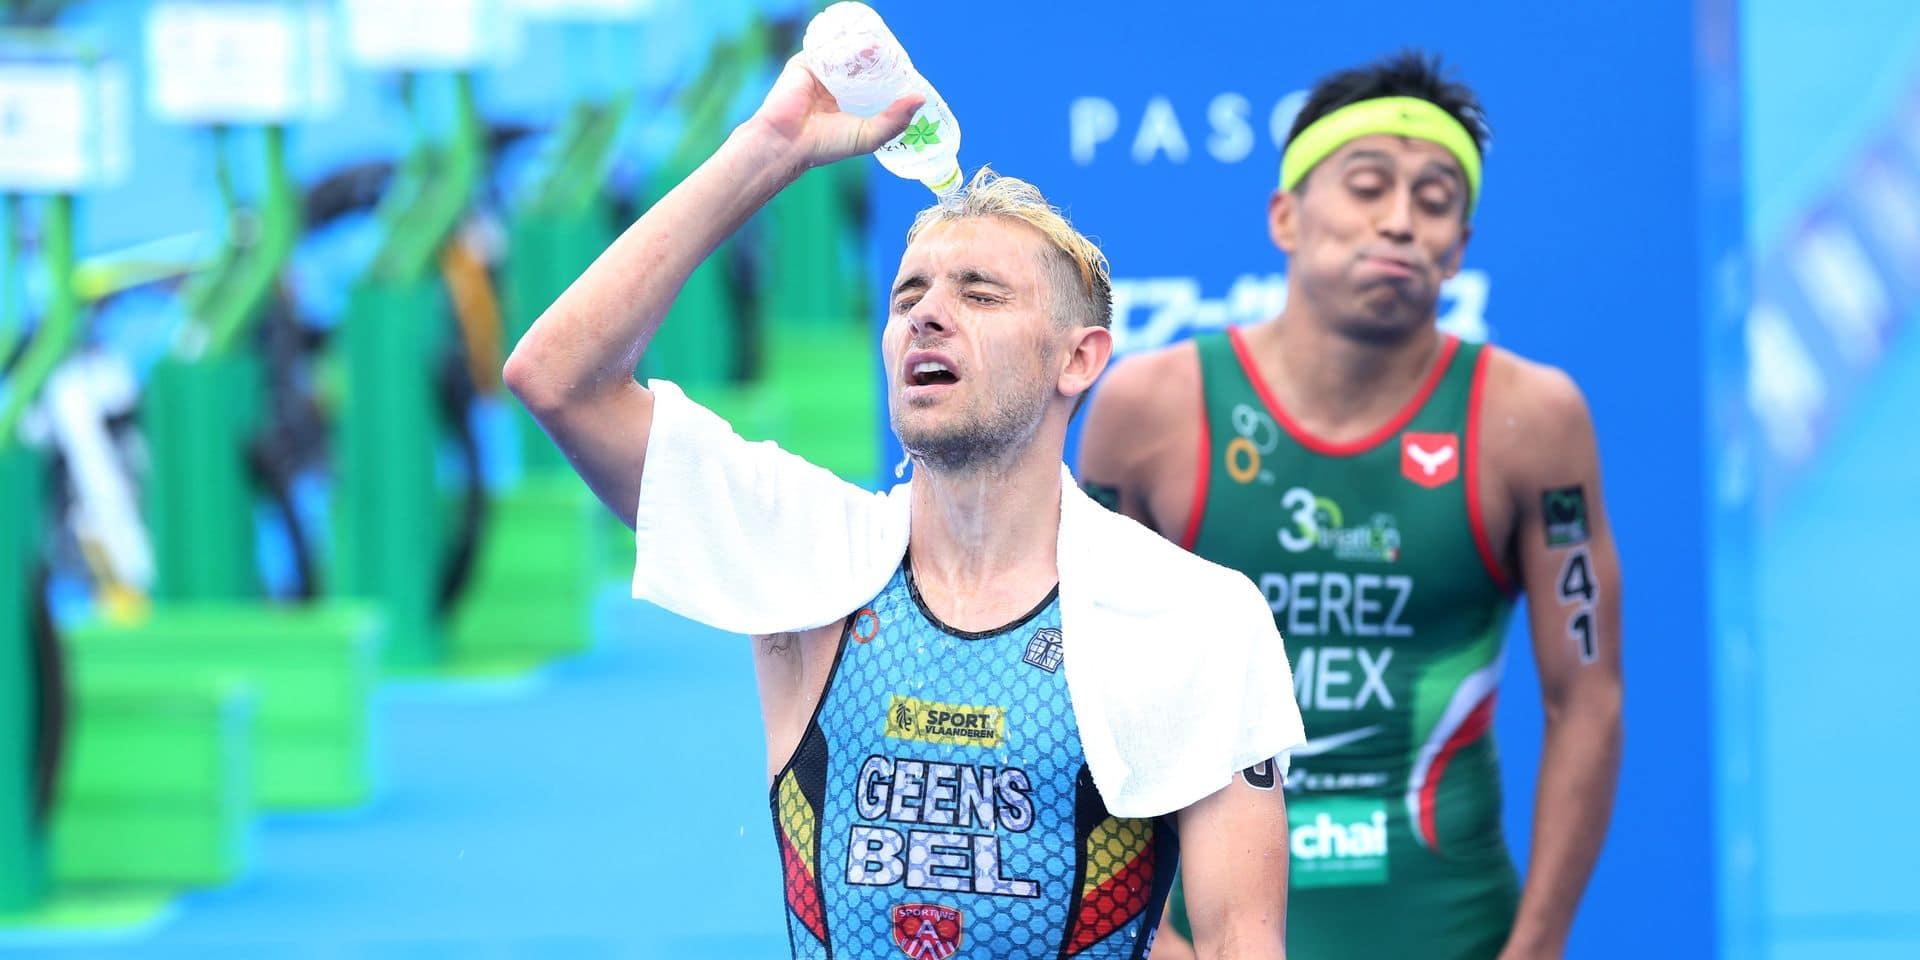 Triathlon : Van Riel a chuté, Geens a craqué, lors du test-event à Tokyo !